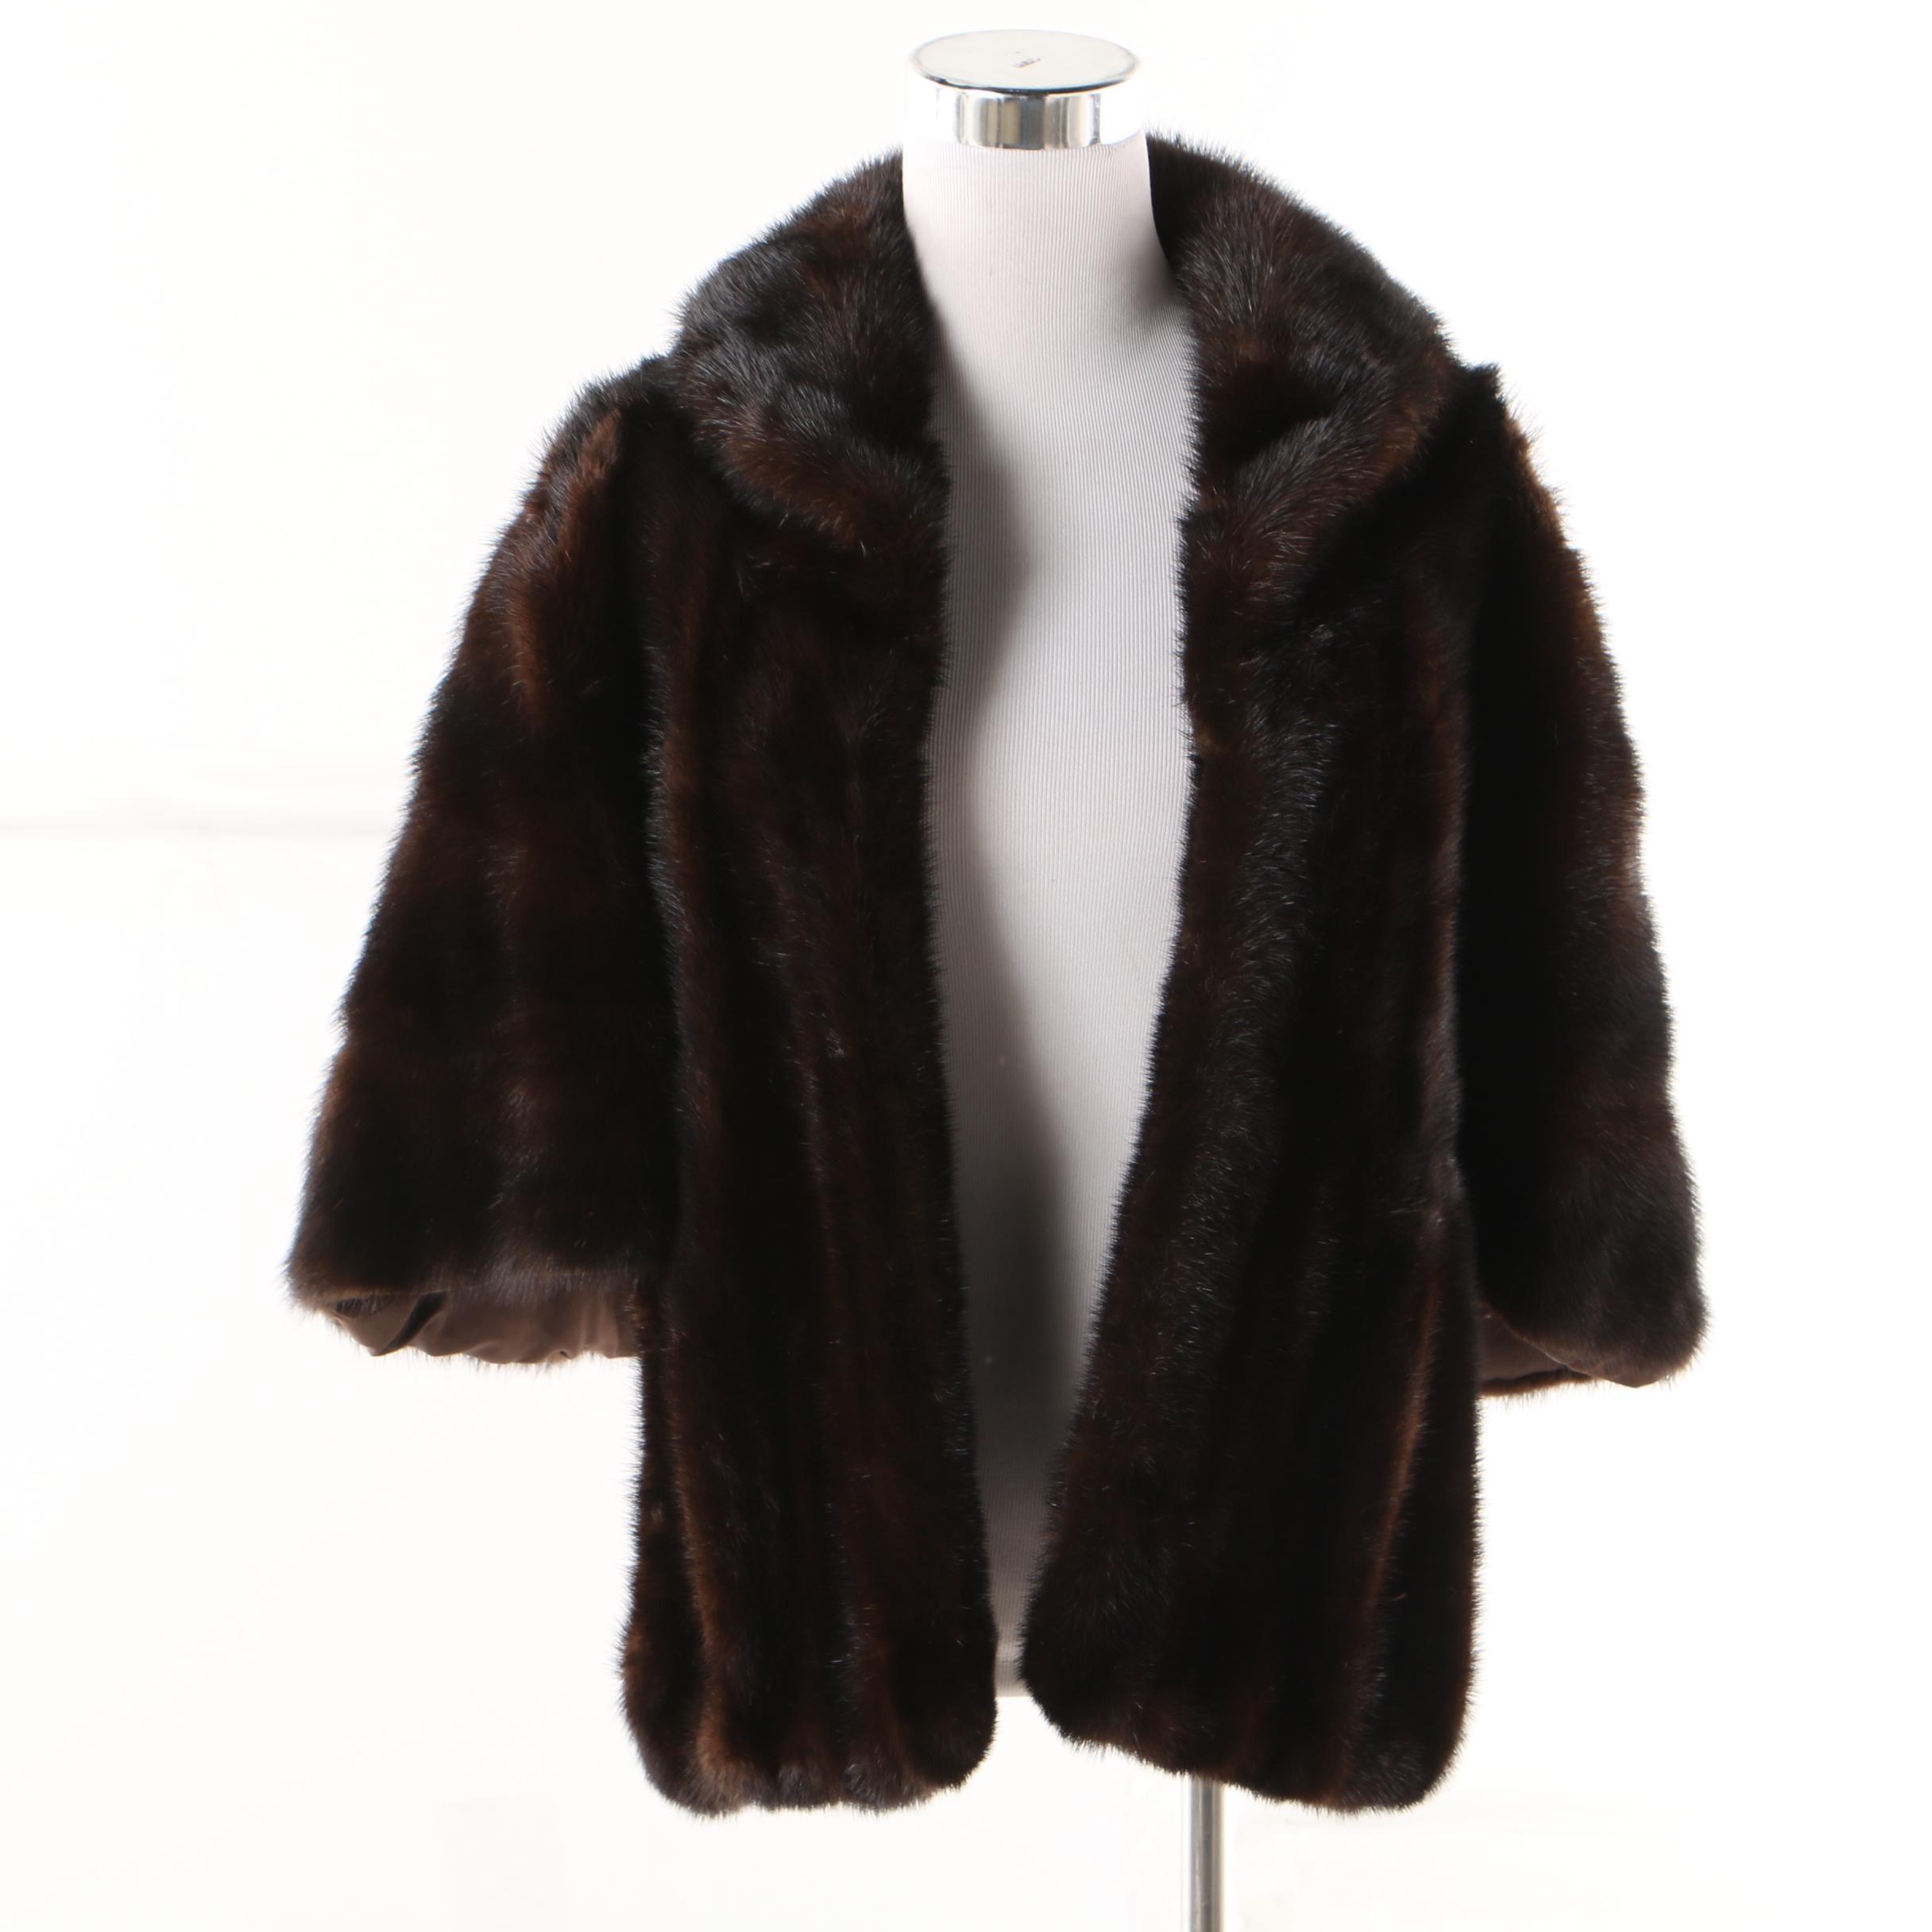 Women's Vintage Marshall Field & Company Mink Fur Stole